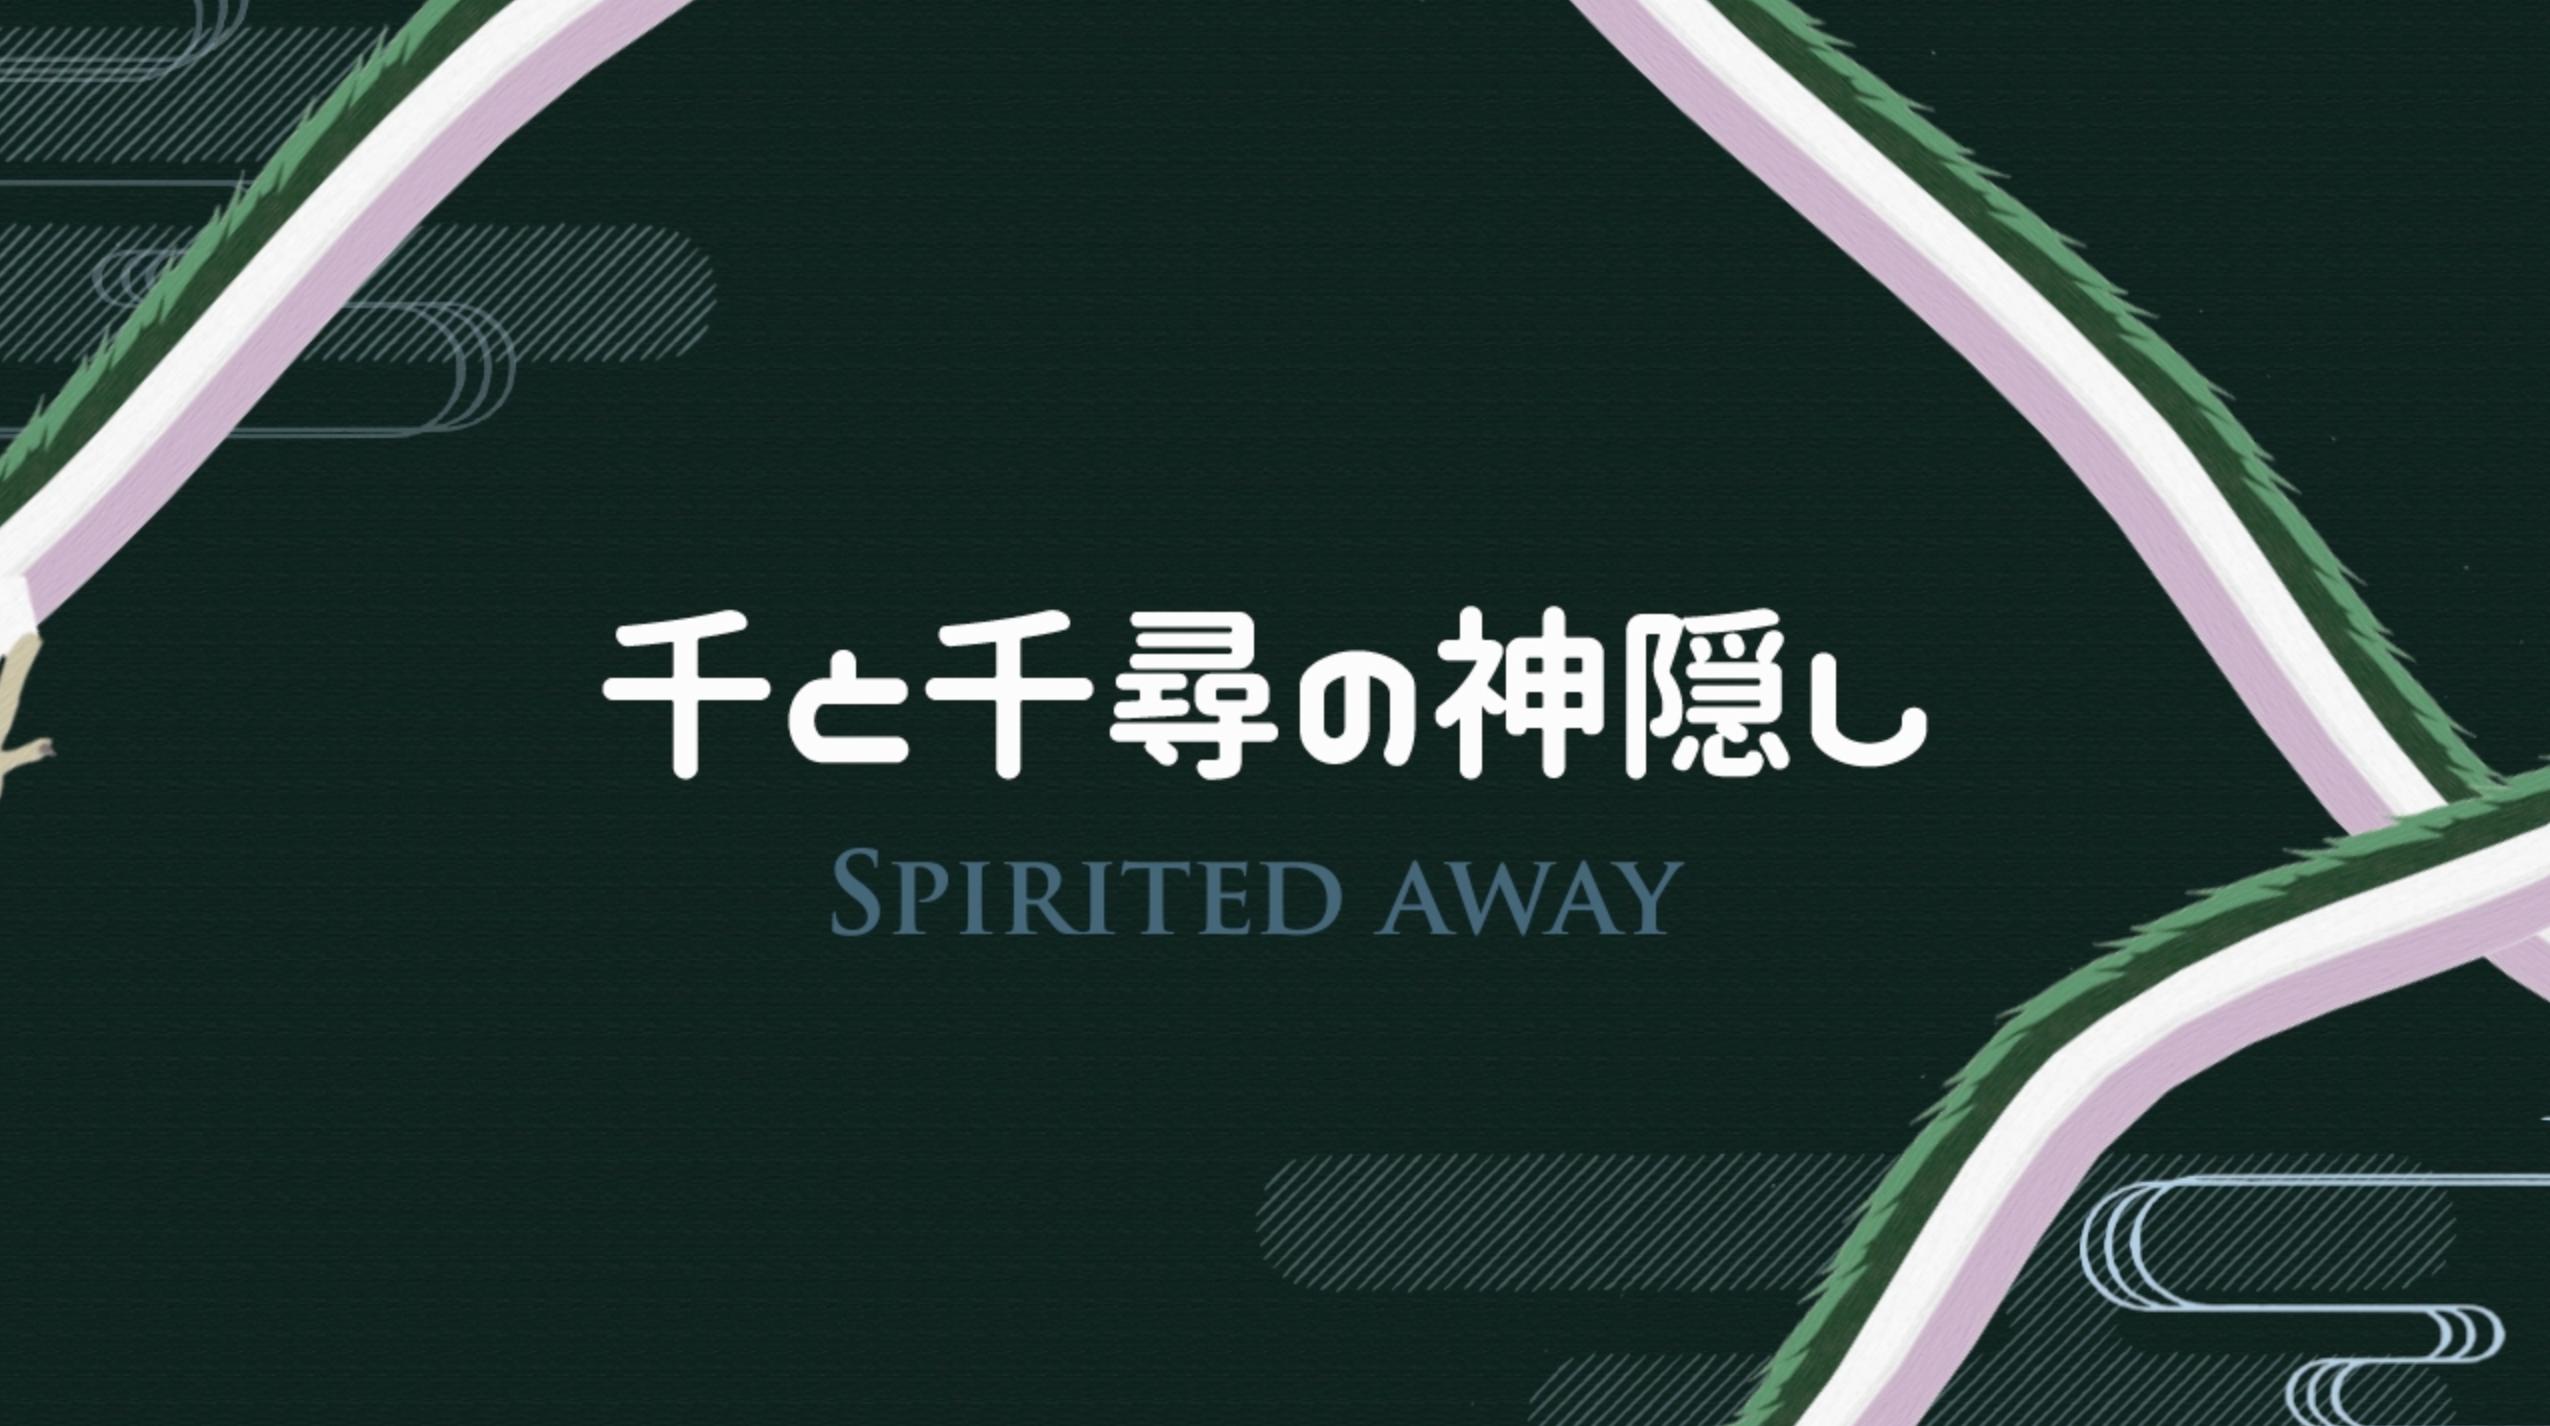 Phoebe Tsai Spirited Away Title Sequence